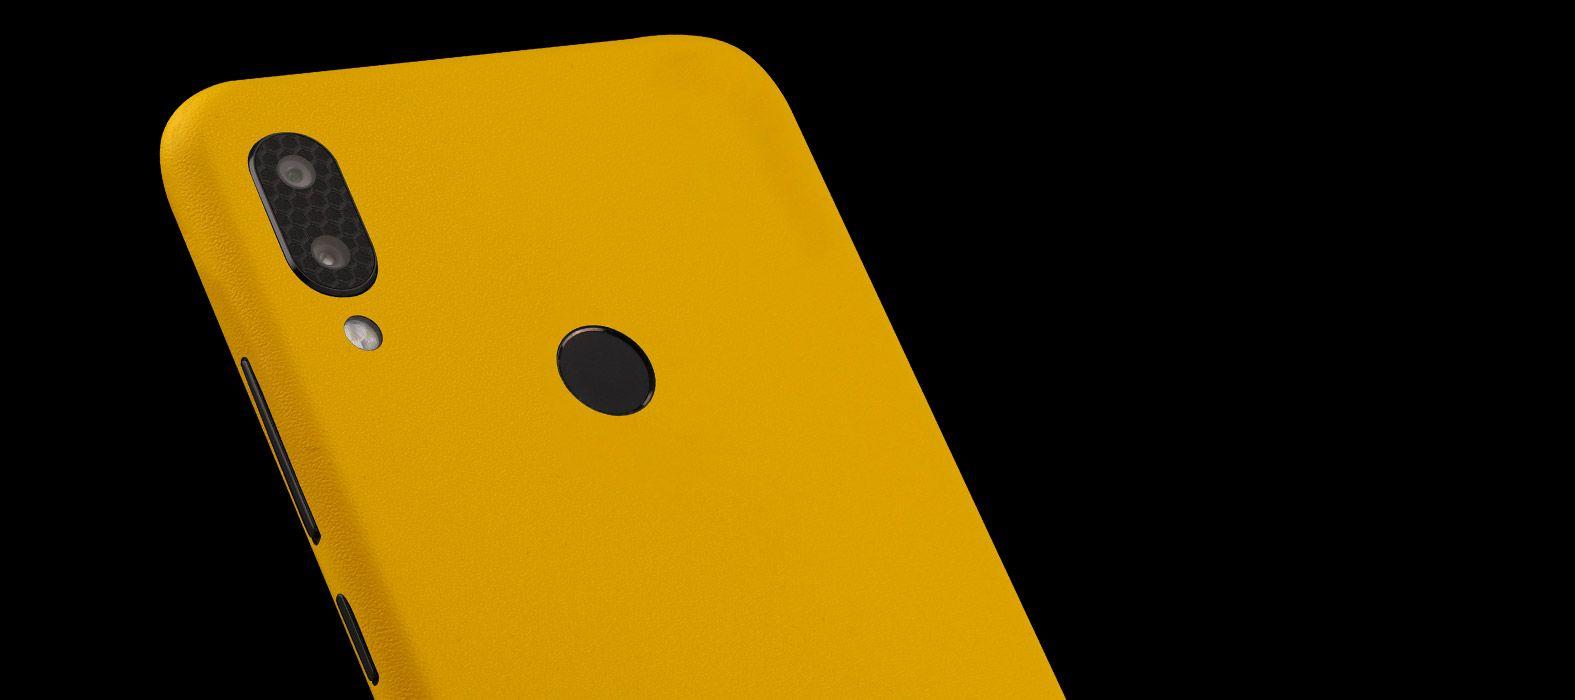 Redmi-note-7-pro_Yellow-Sandstone_Skins